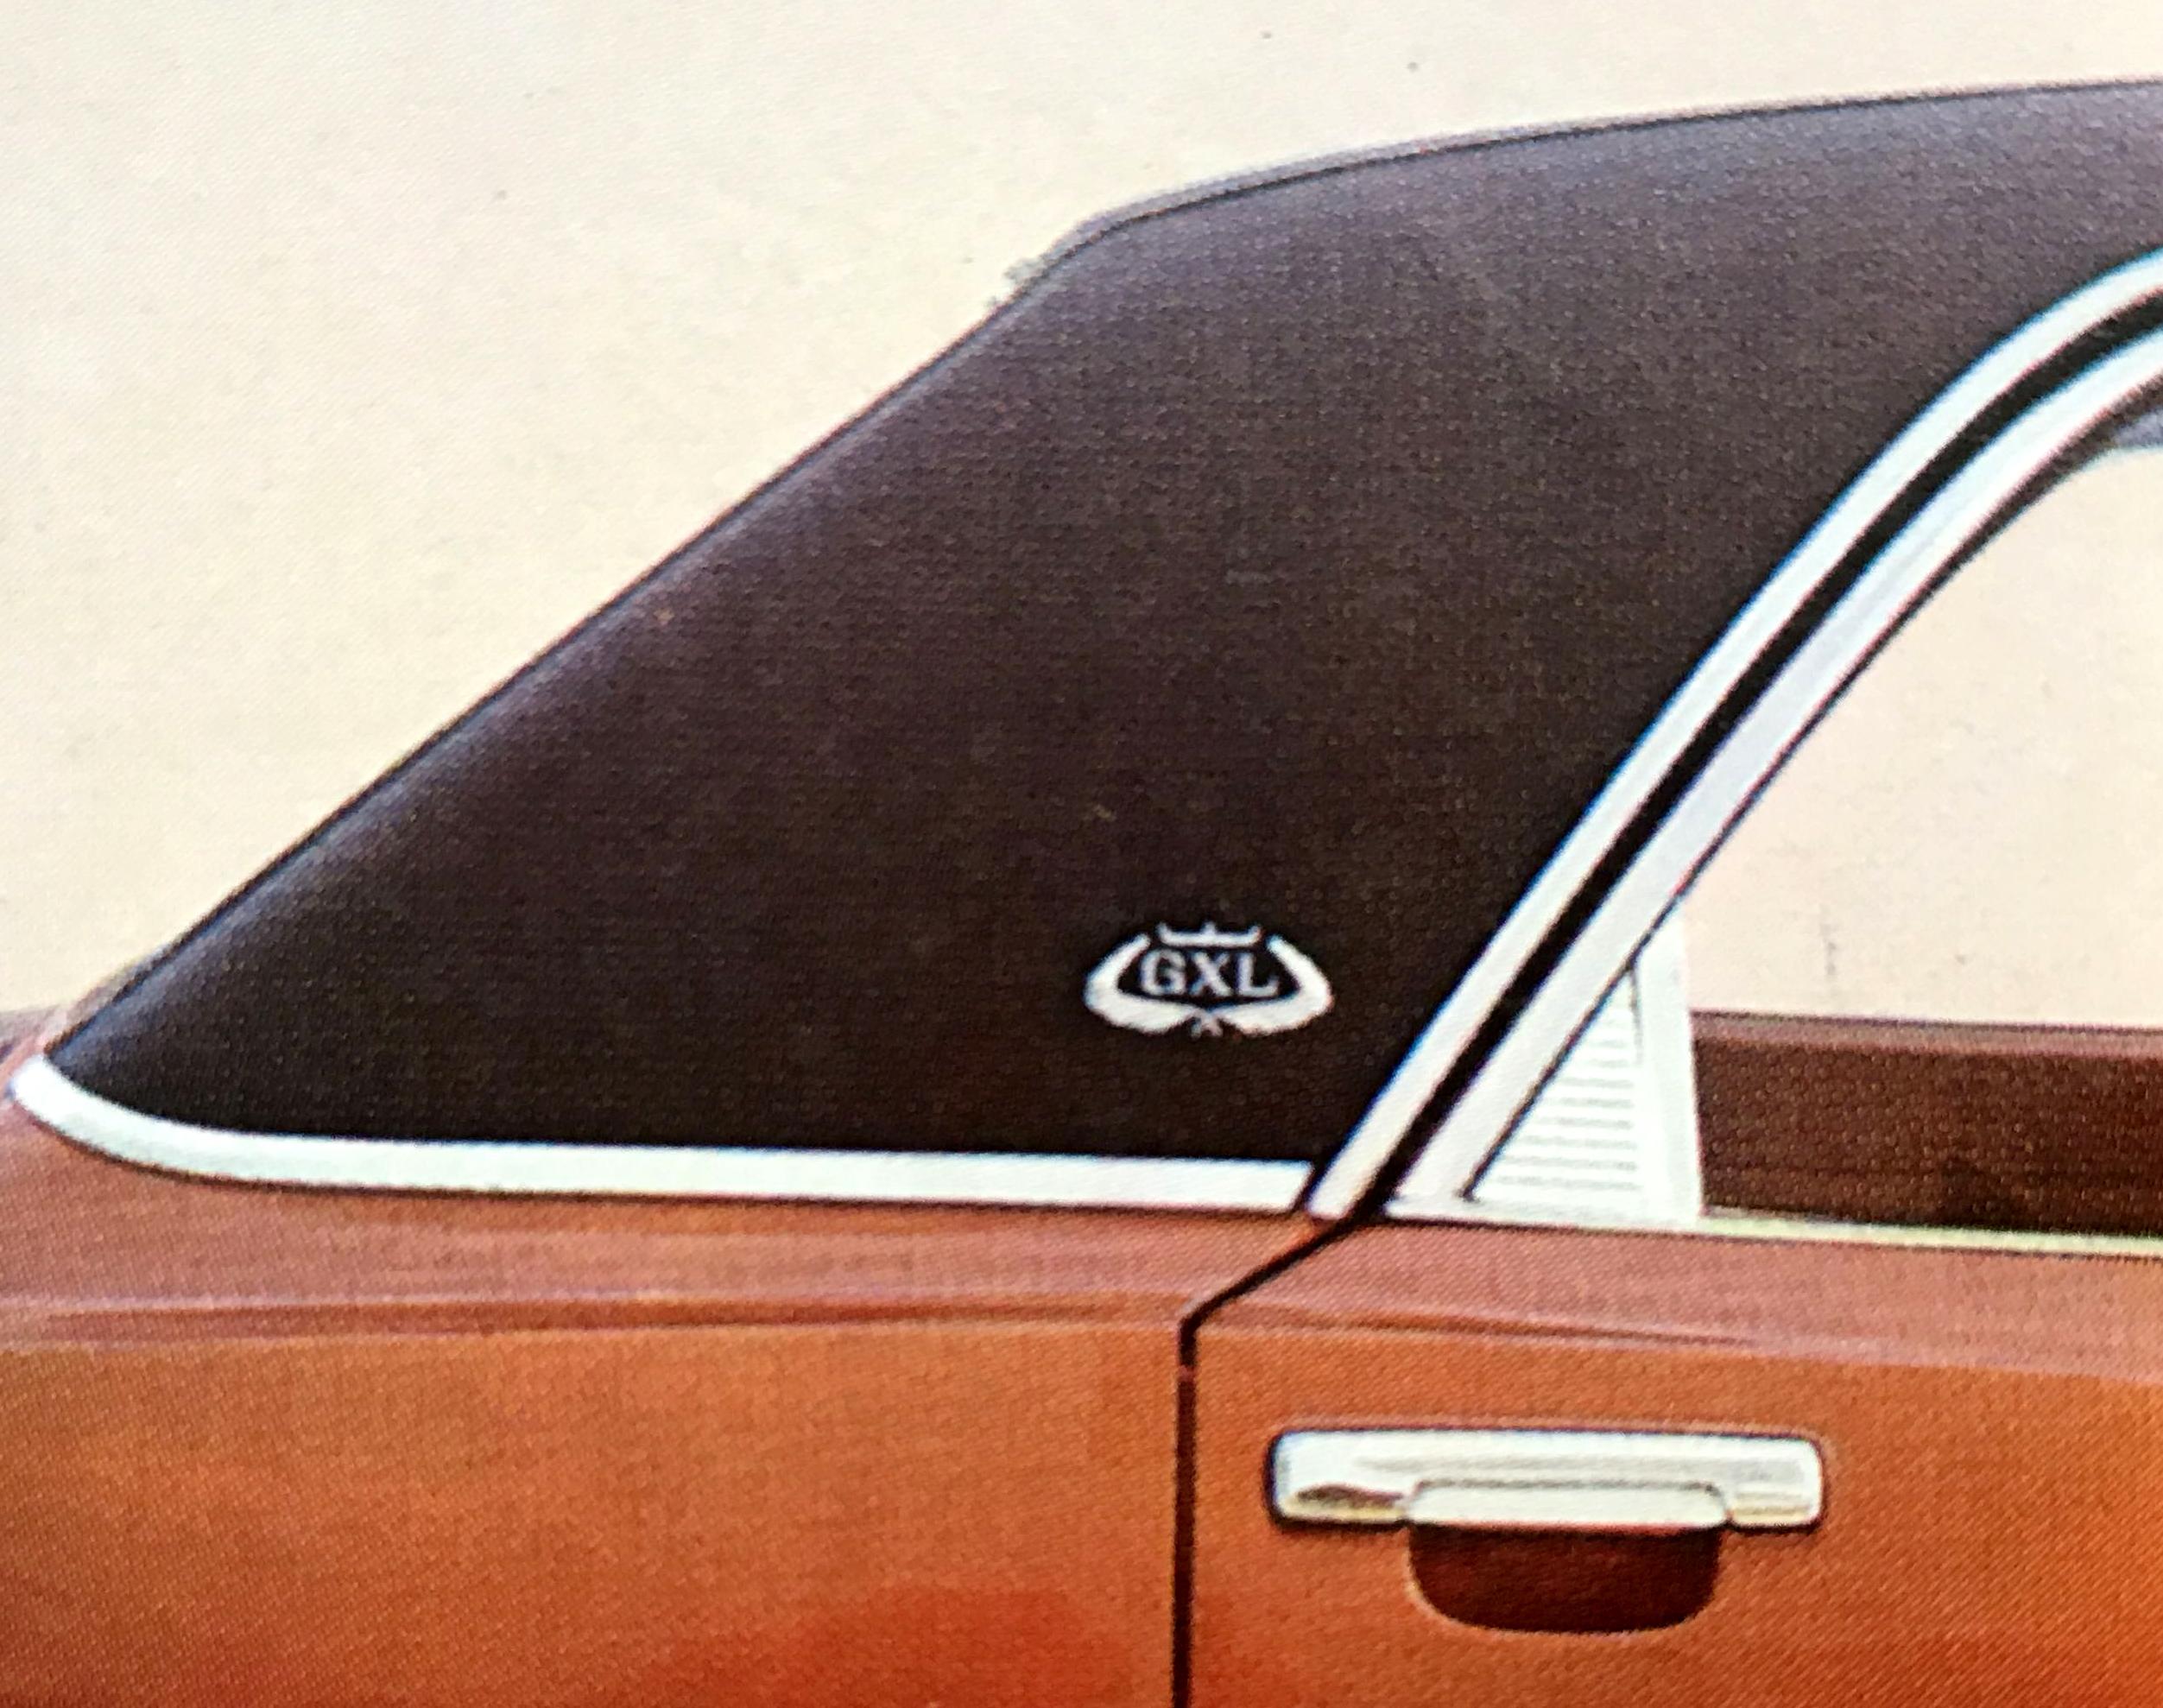 Toit vinyl noir avec emblème GXL